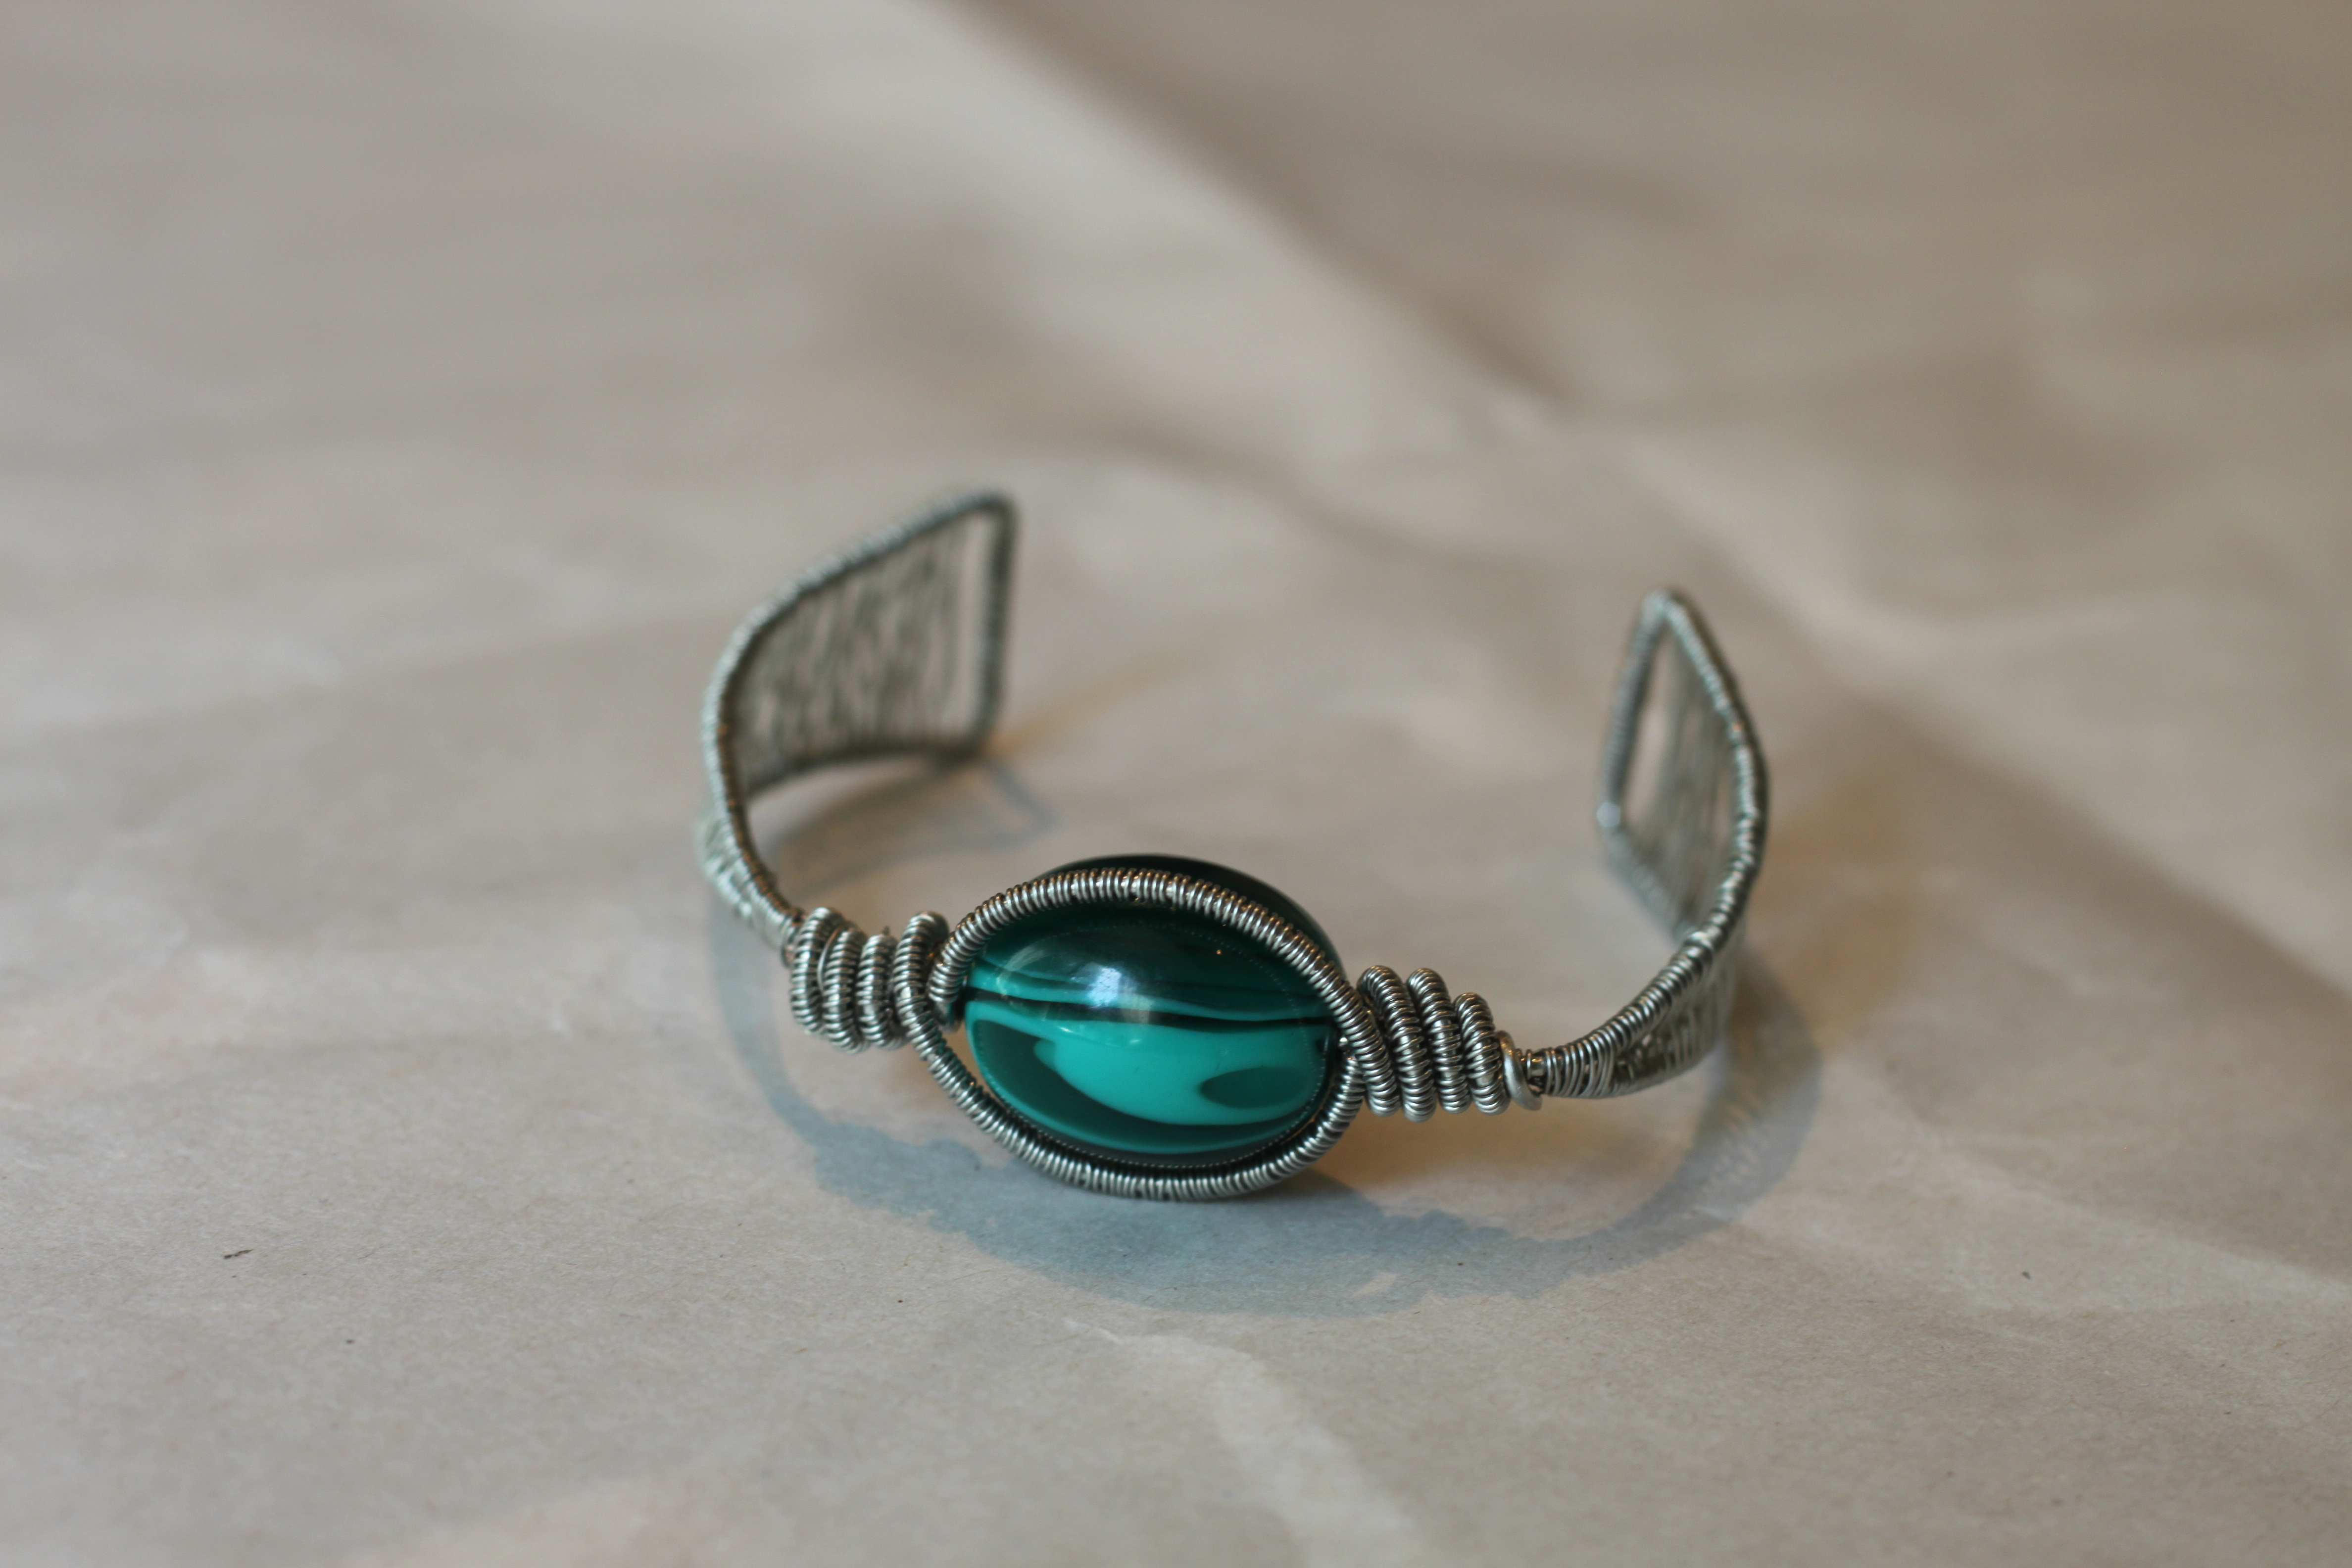 Woven coiled cuff copper bracelet